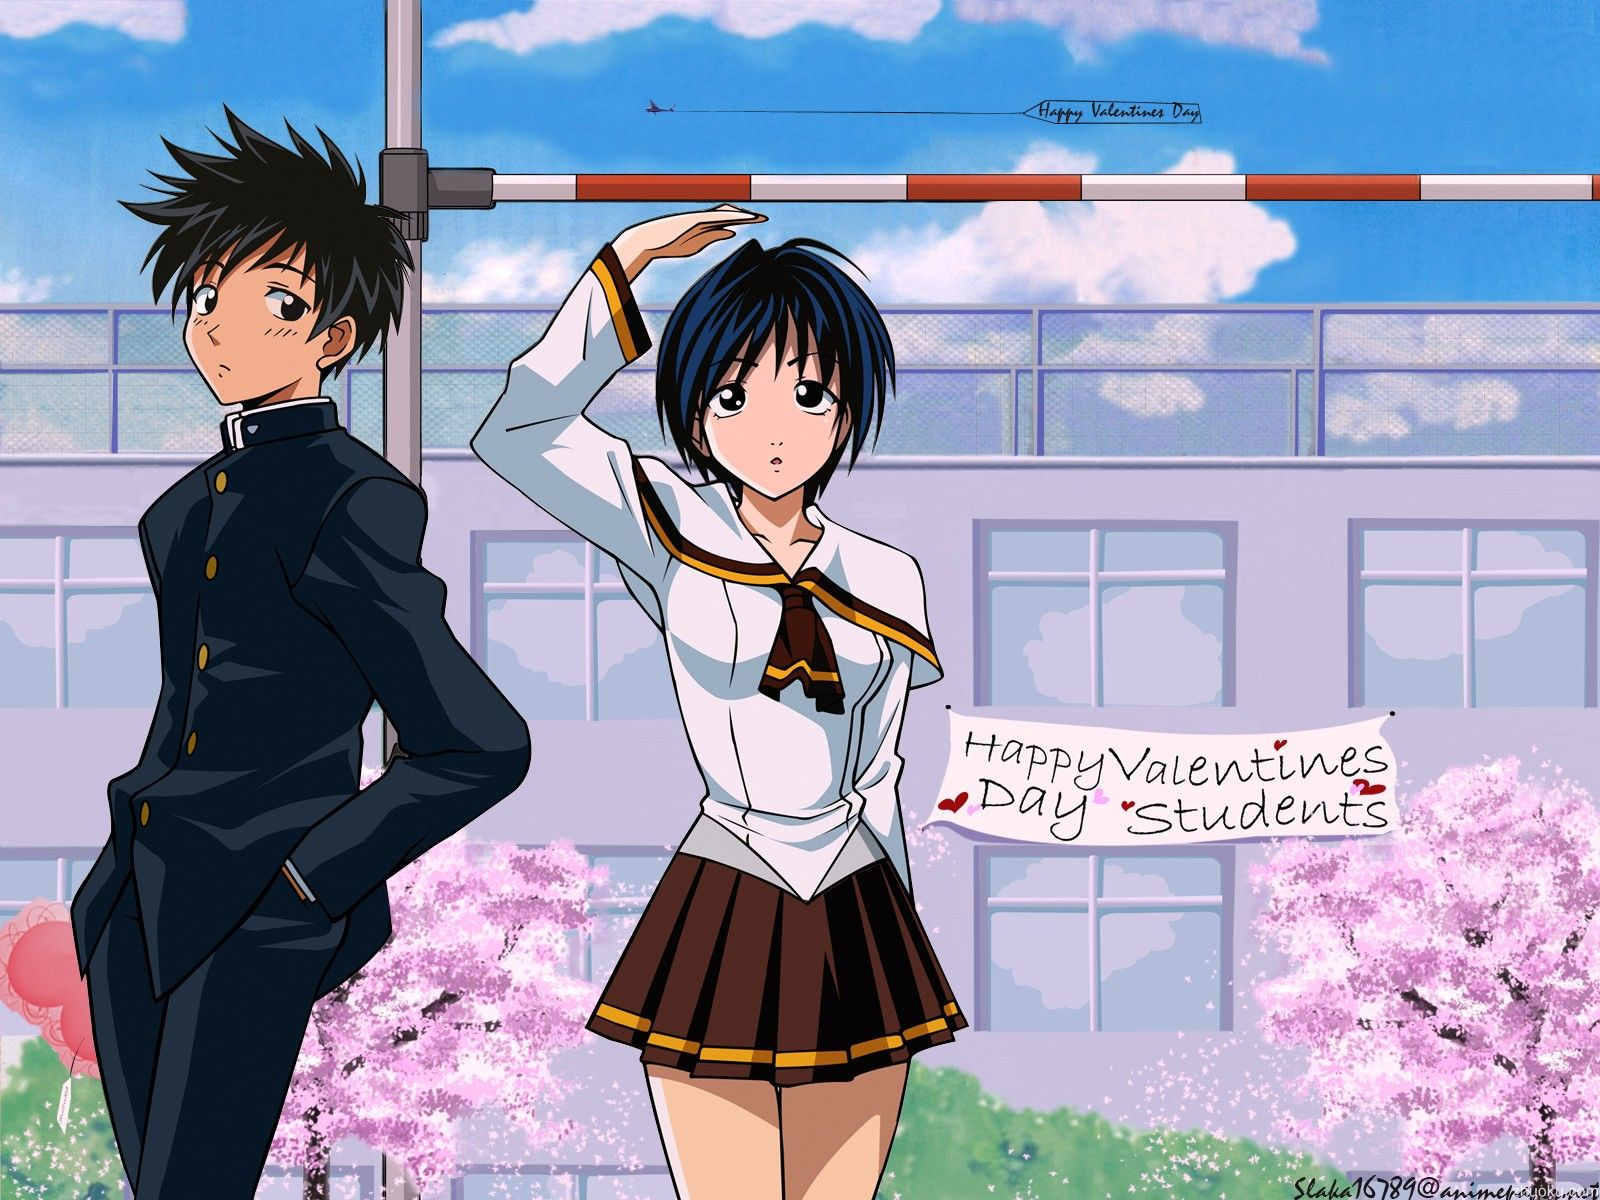 Suzuka is about a skilled high jumper Suzuka Asahina and a